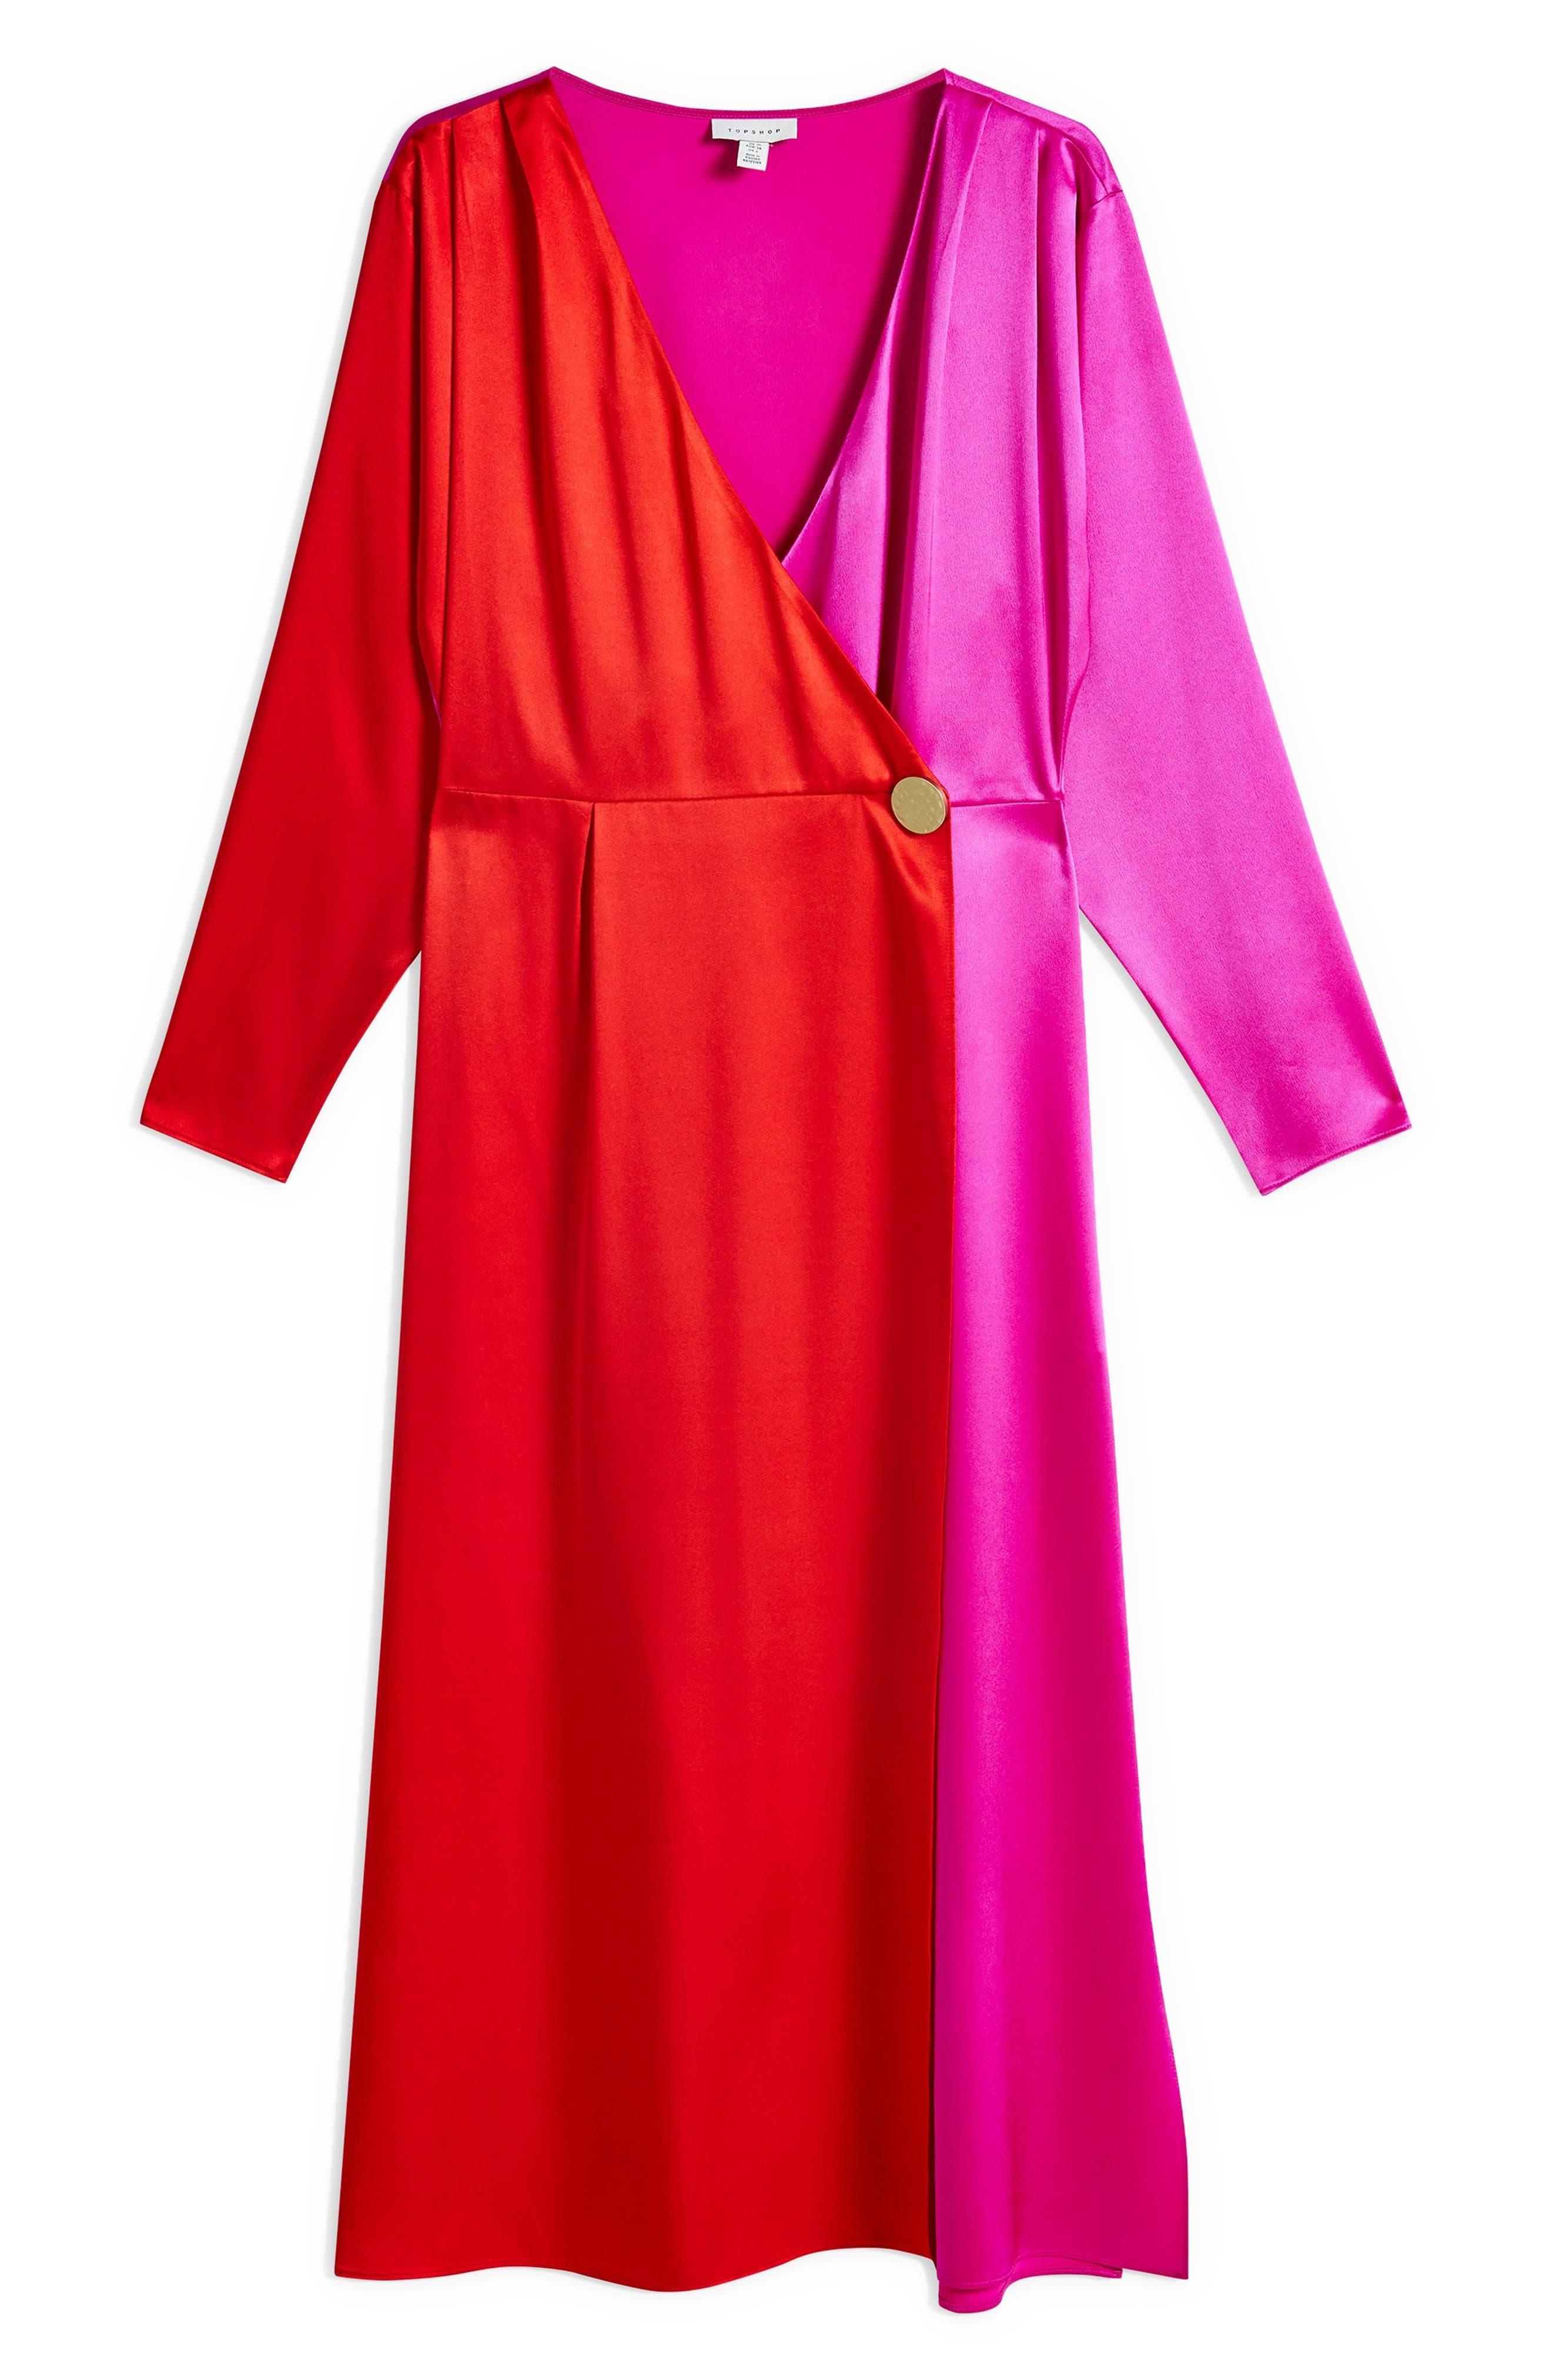 TOPSHOP,                             Colorblock Dress,                             Alternate thumbnail 3, color,                             PINK MULTI